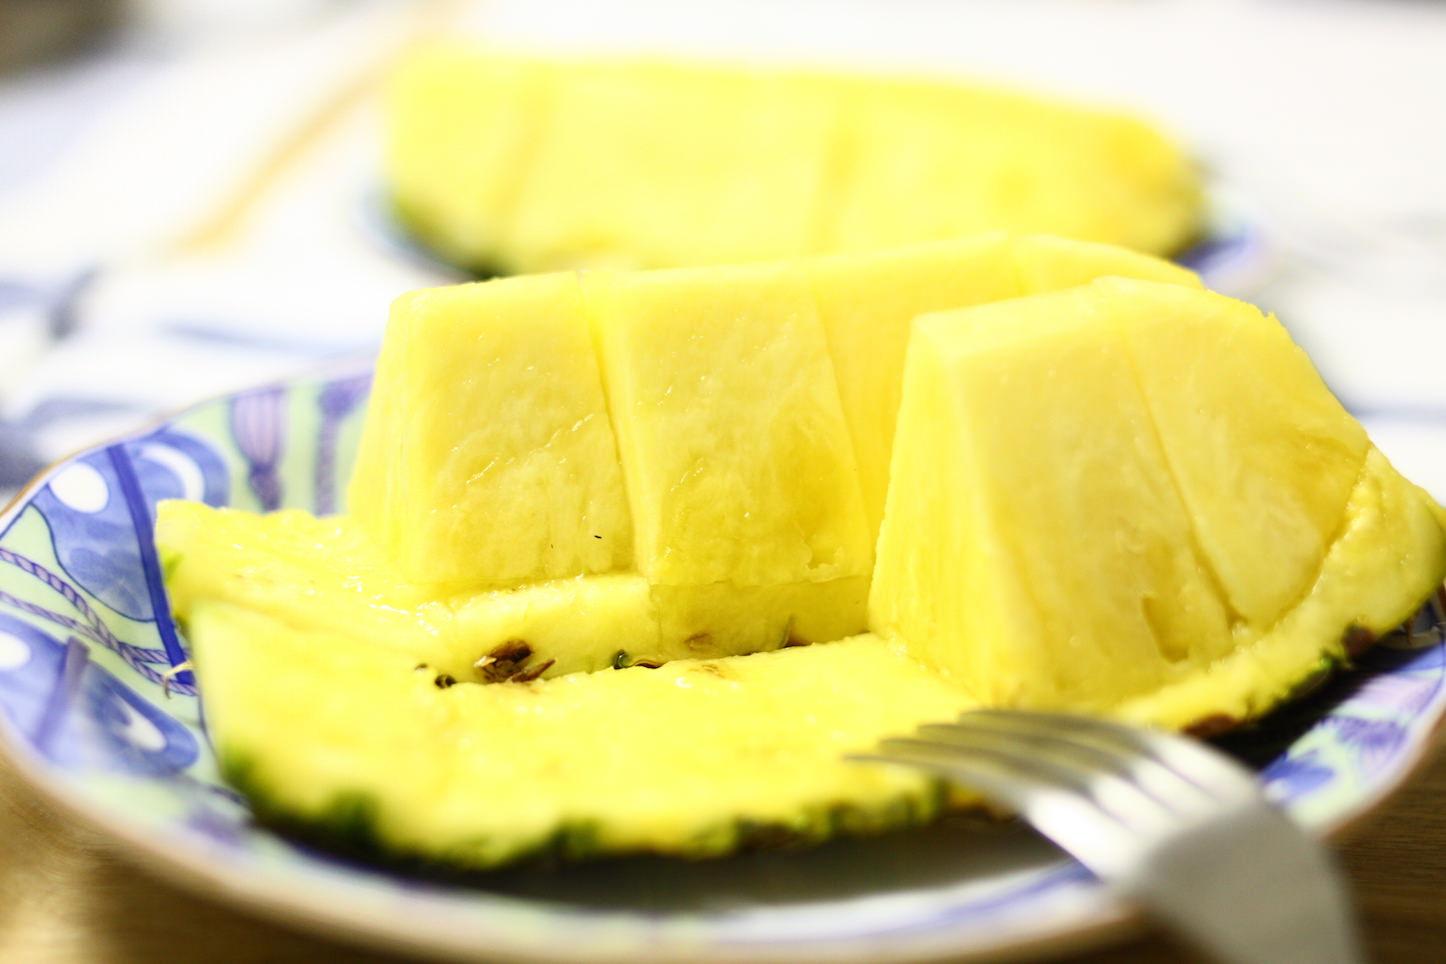 pineapple-photo-cut-ready-to-eat.jpg